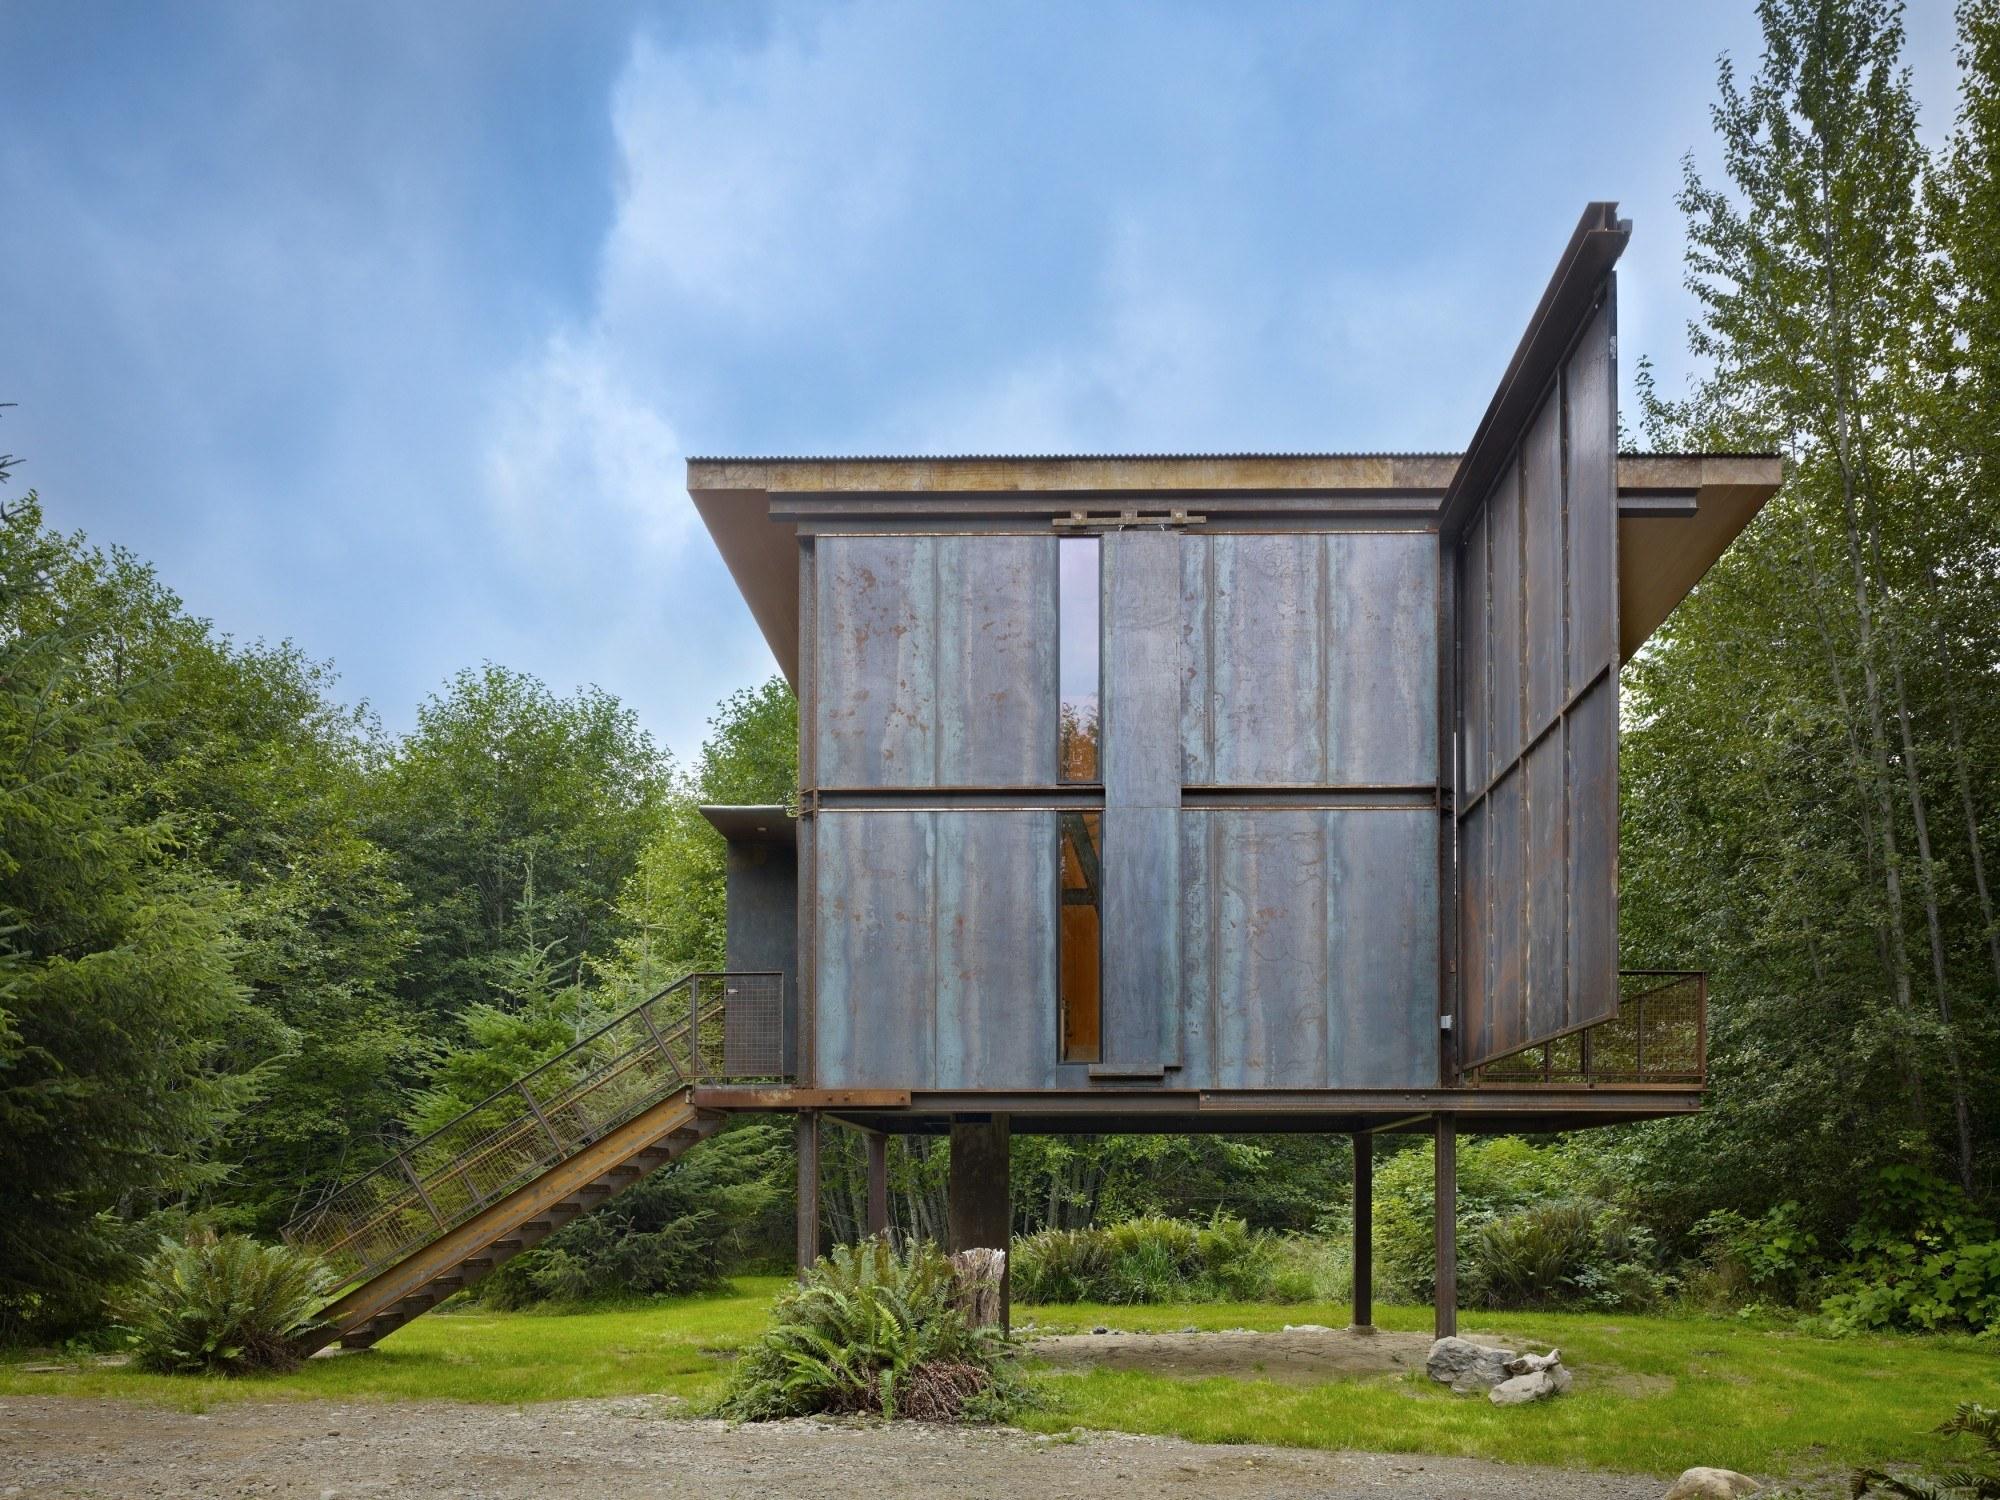 sol-duc-cabin-cabane-peche-Olson Kundig-0